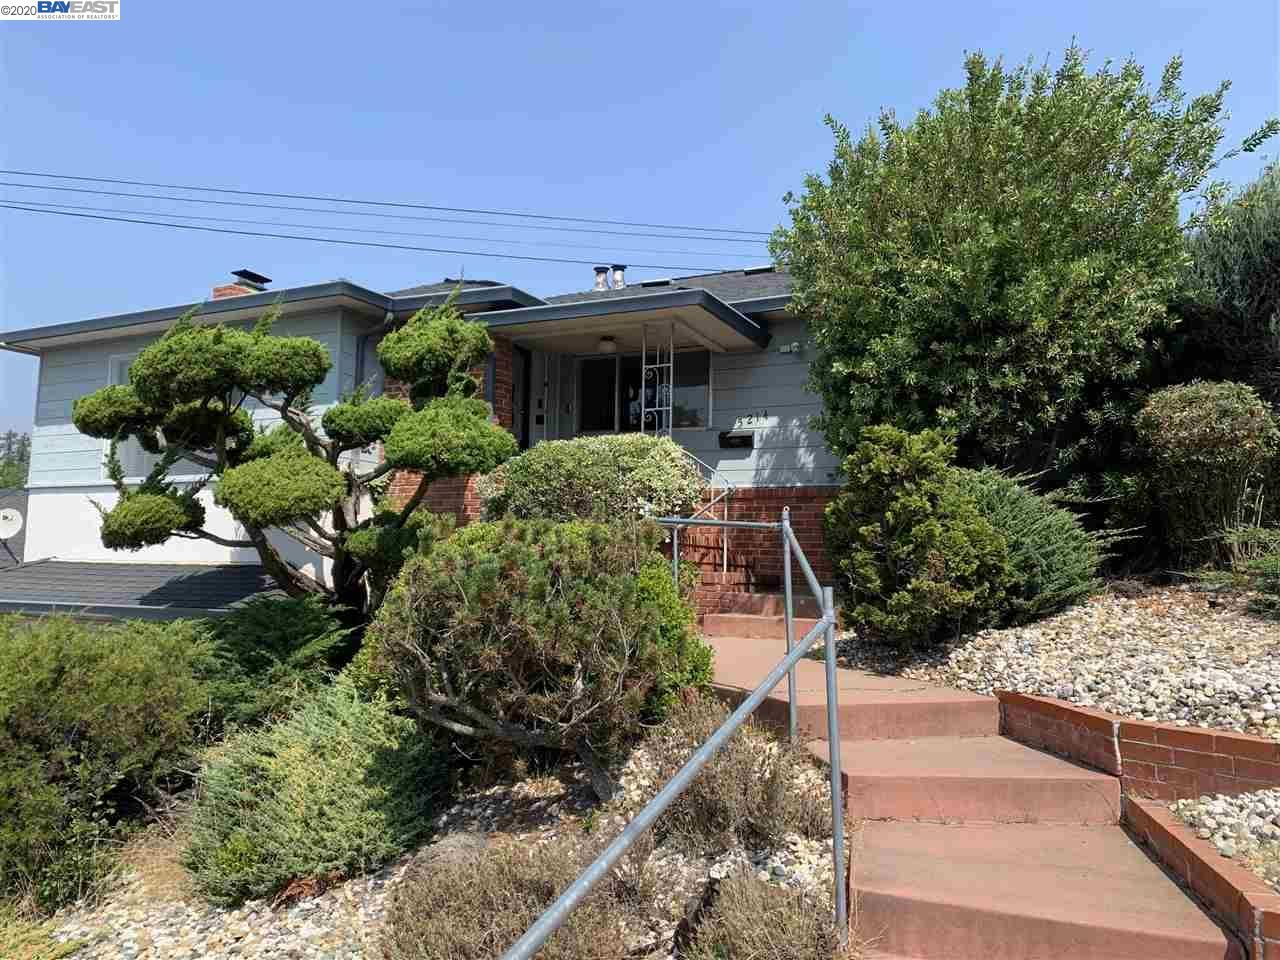 5214 Seaview Ave, Castro Valley, CA 94546 - MLS#: 40920799